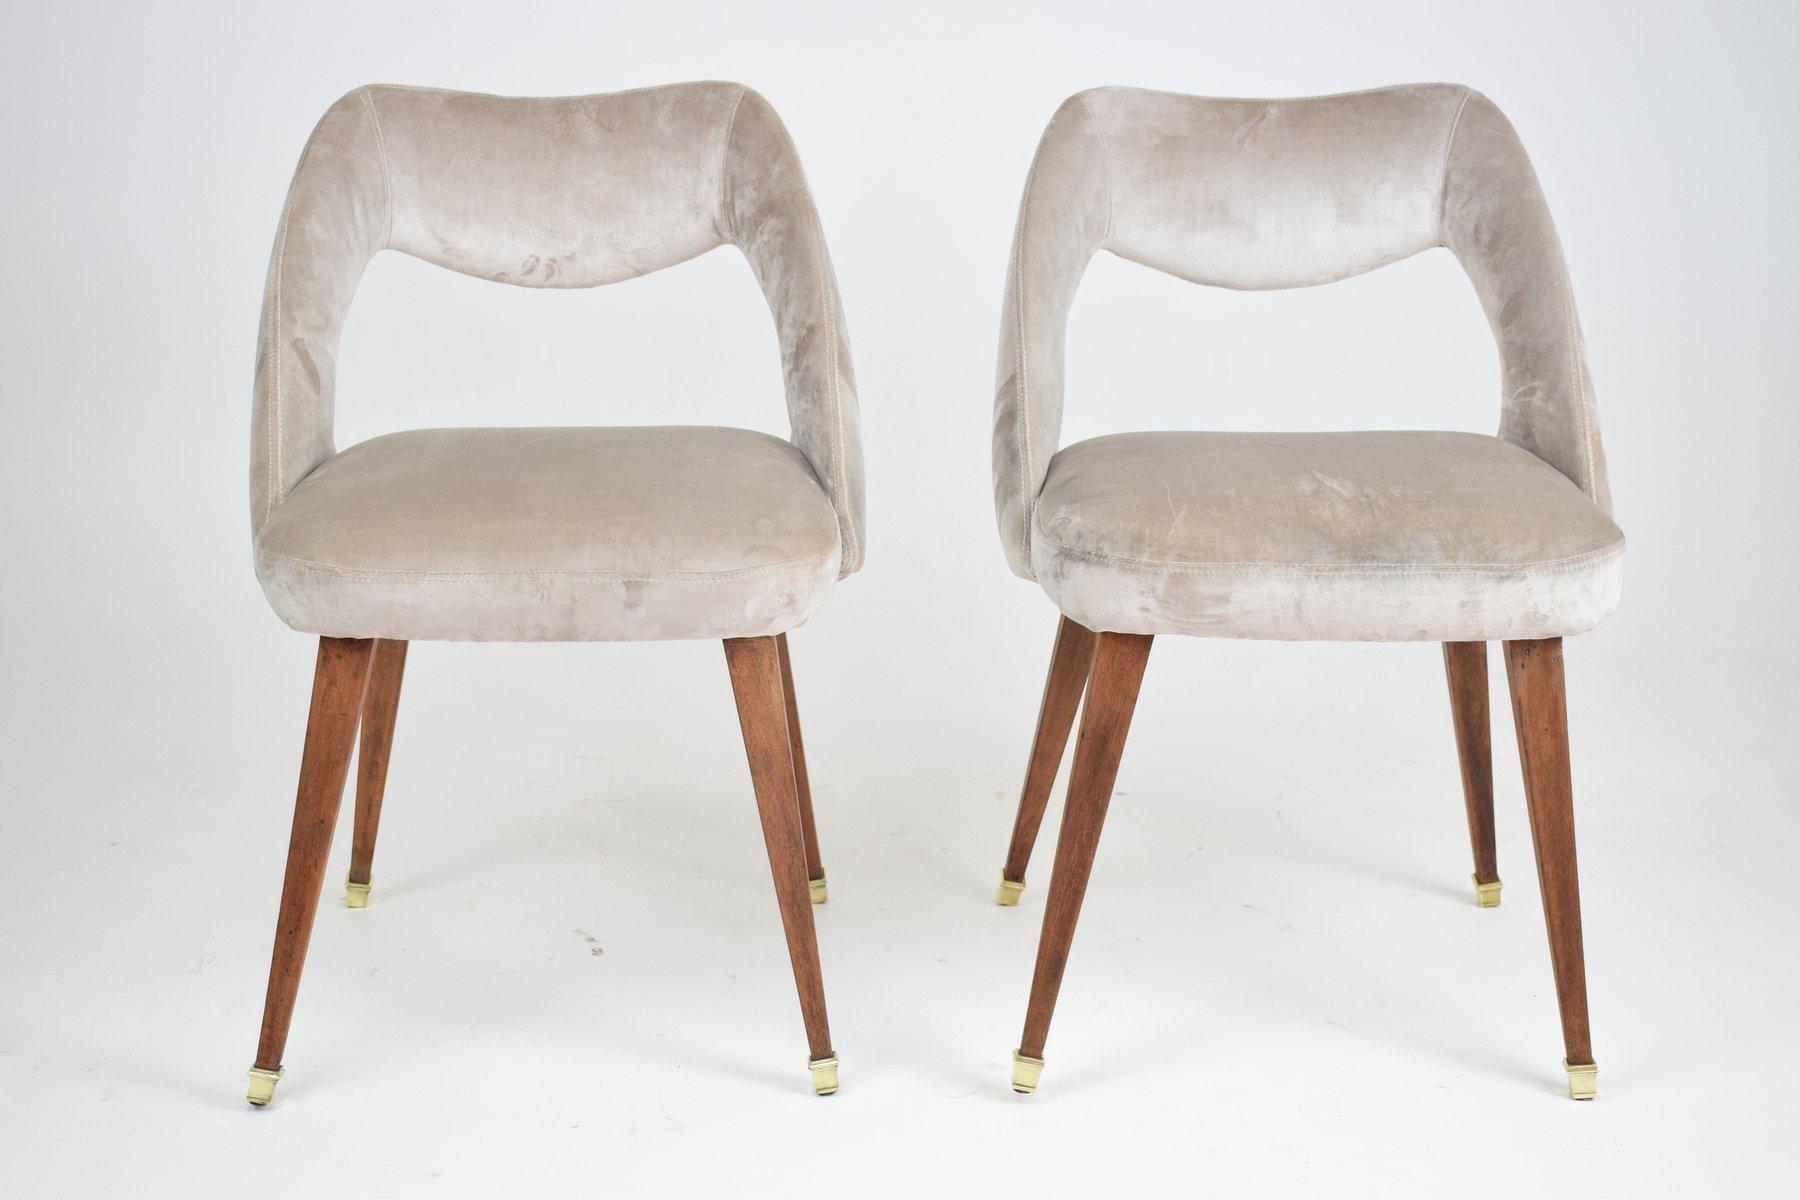 stuhl mit samtbezug 1970er bei pamono kaufen. Black Bedroom Furniture Sets. Home Design Ideas